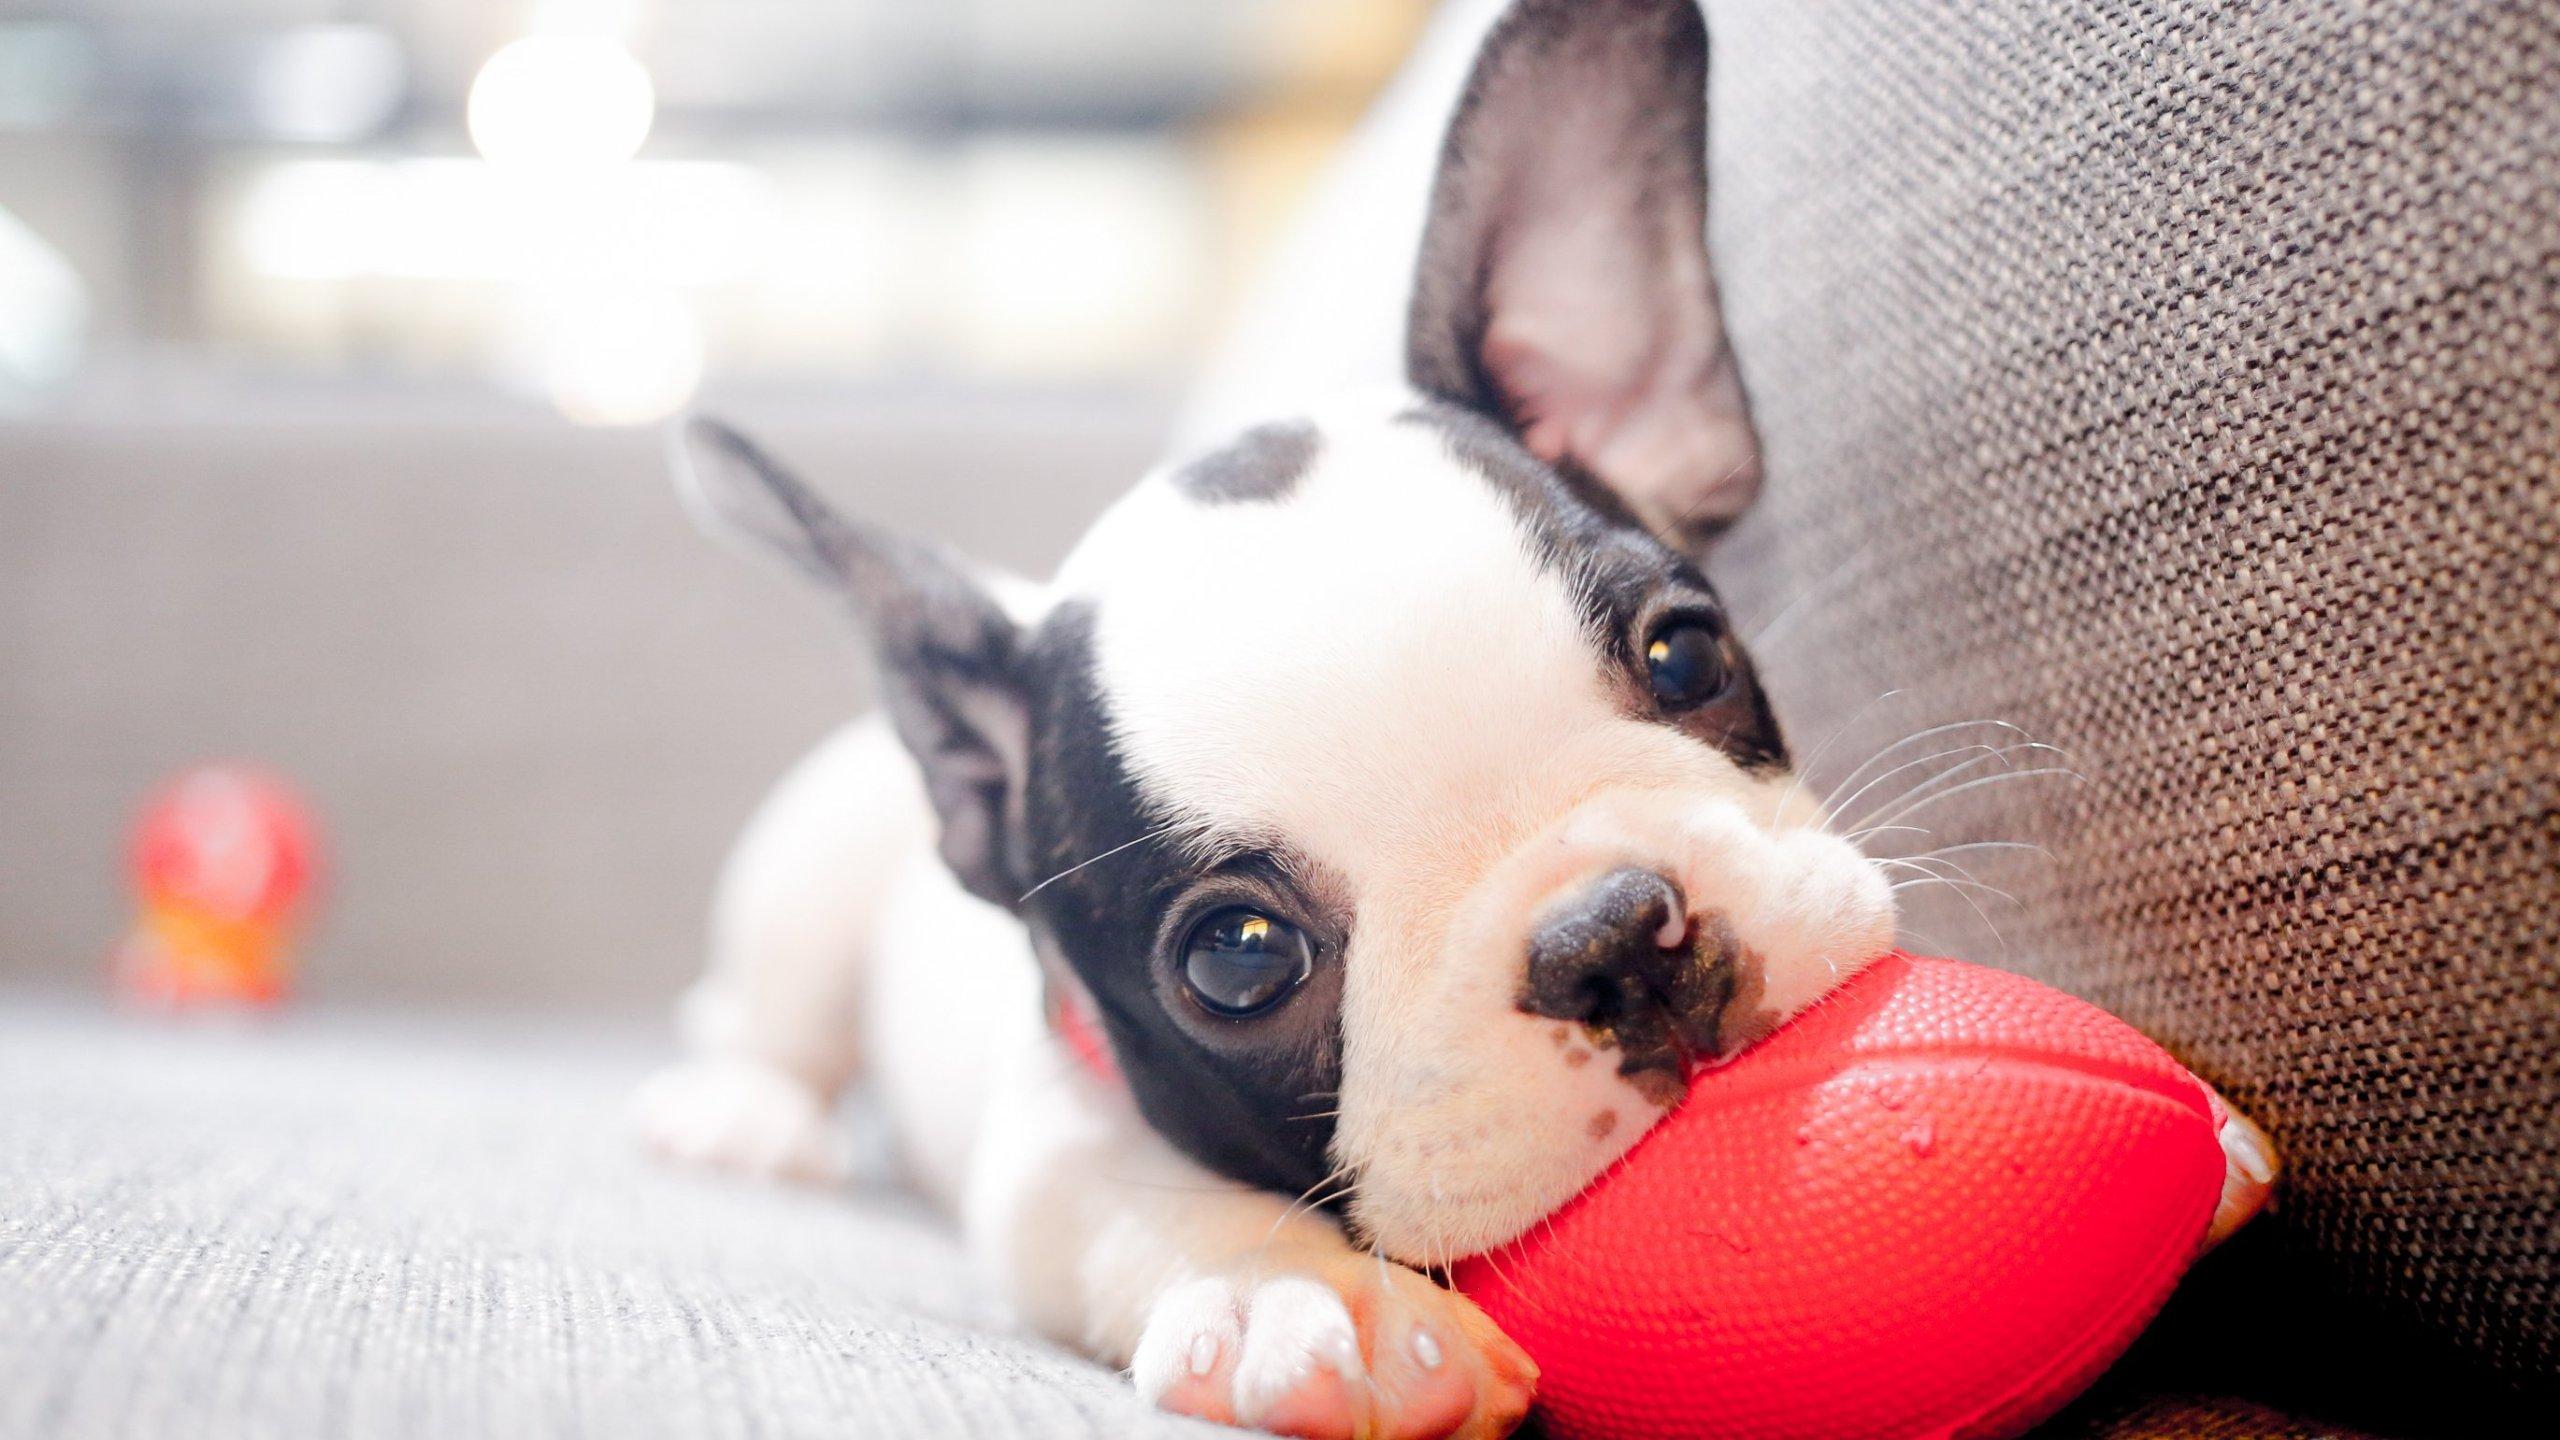 Dogs help us live longer